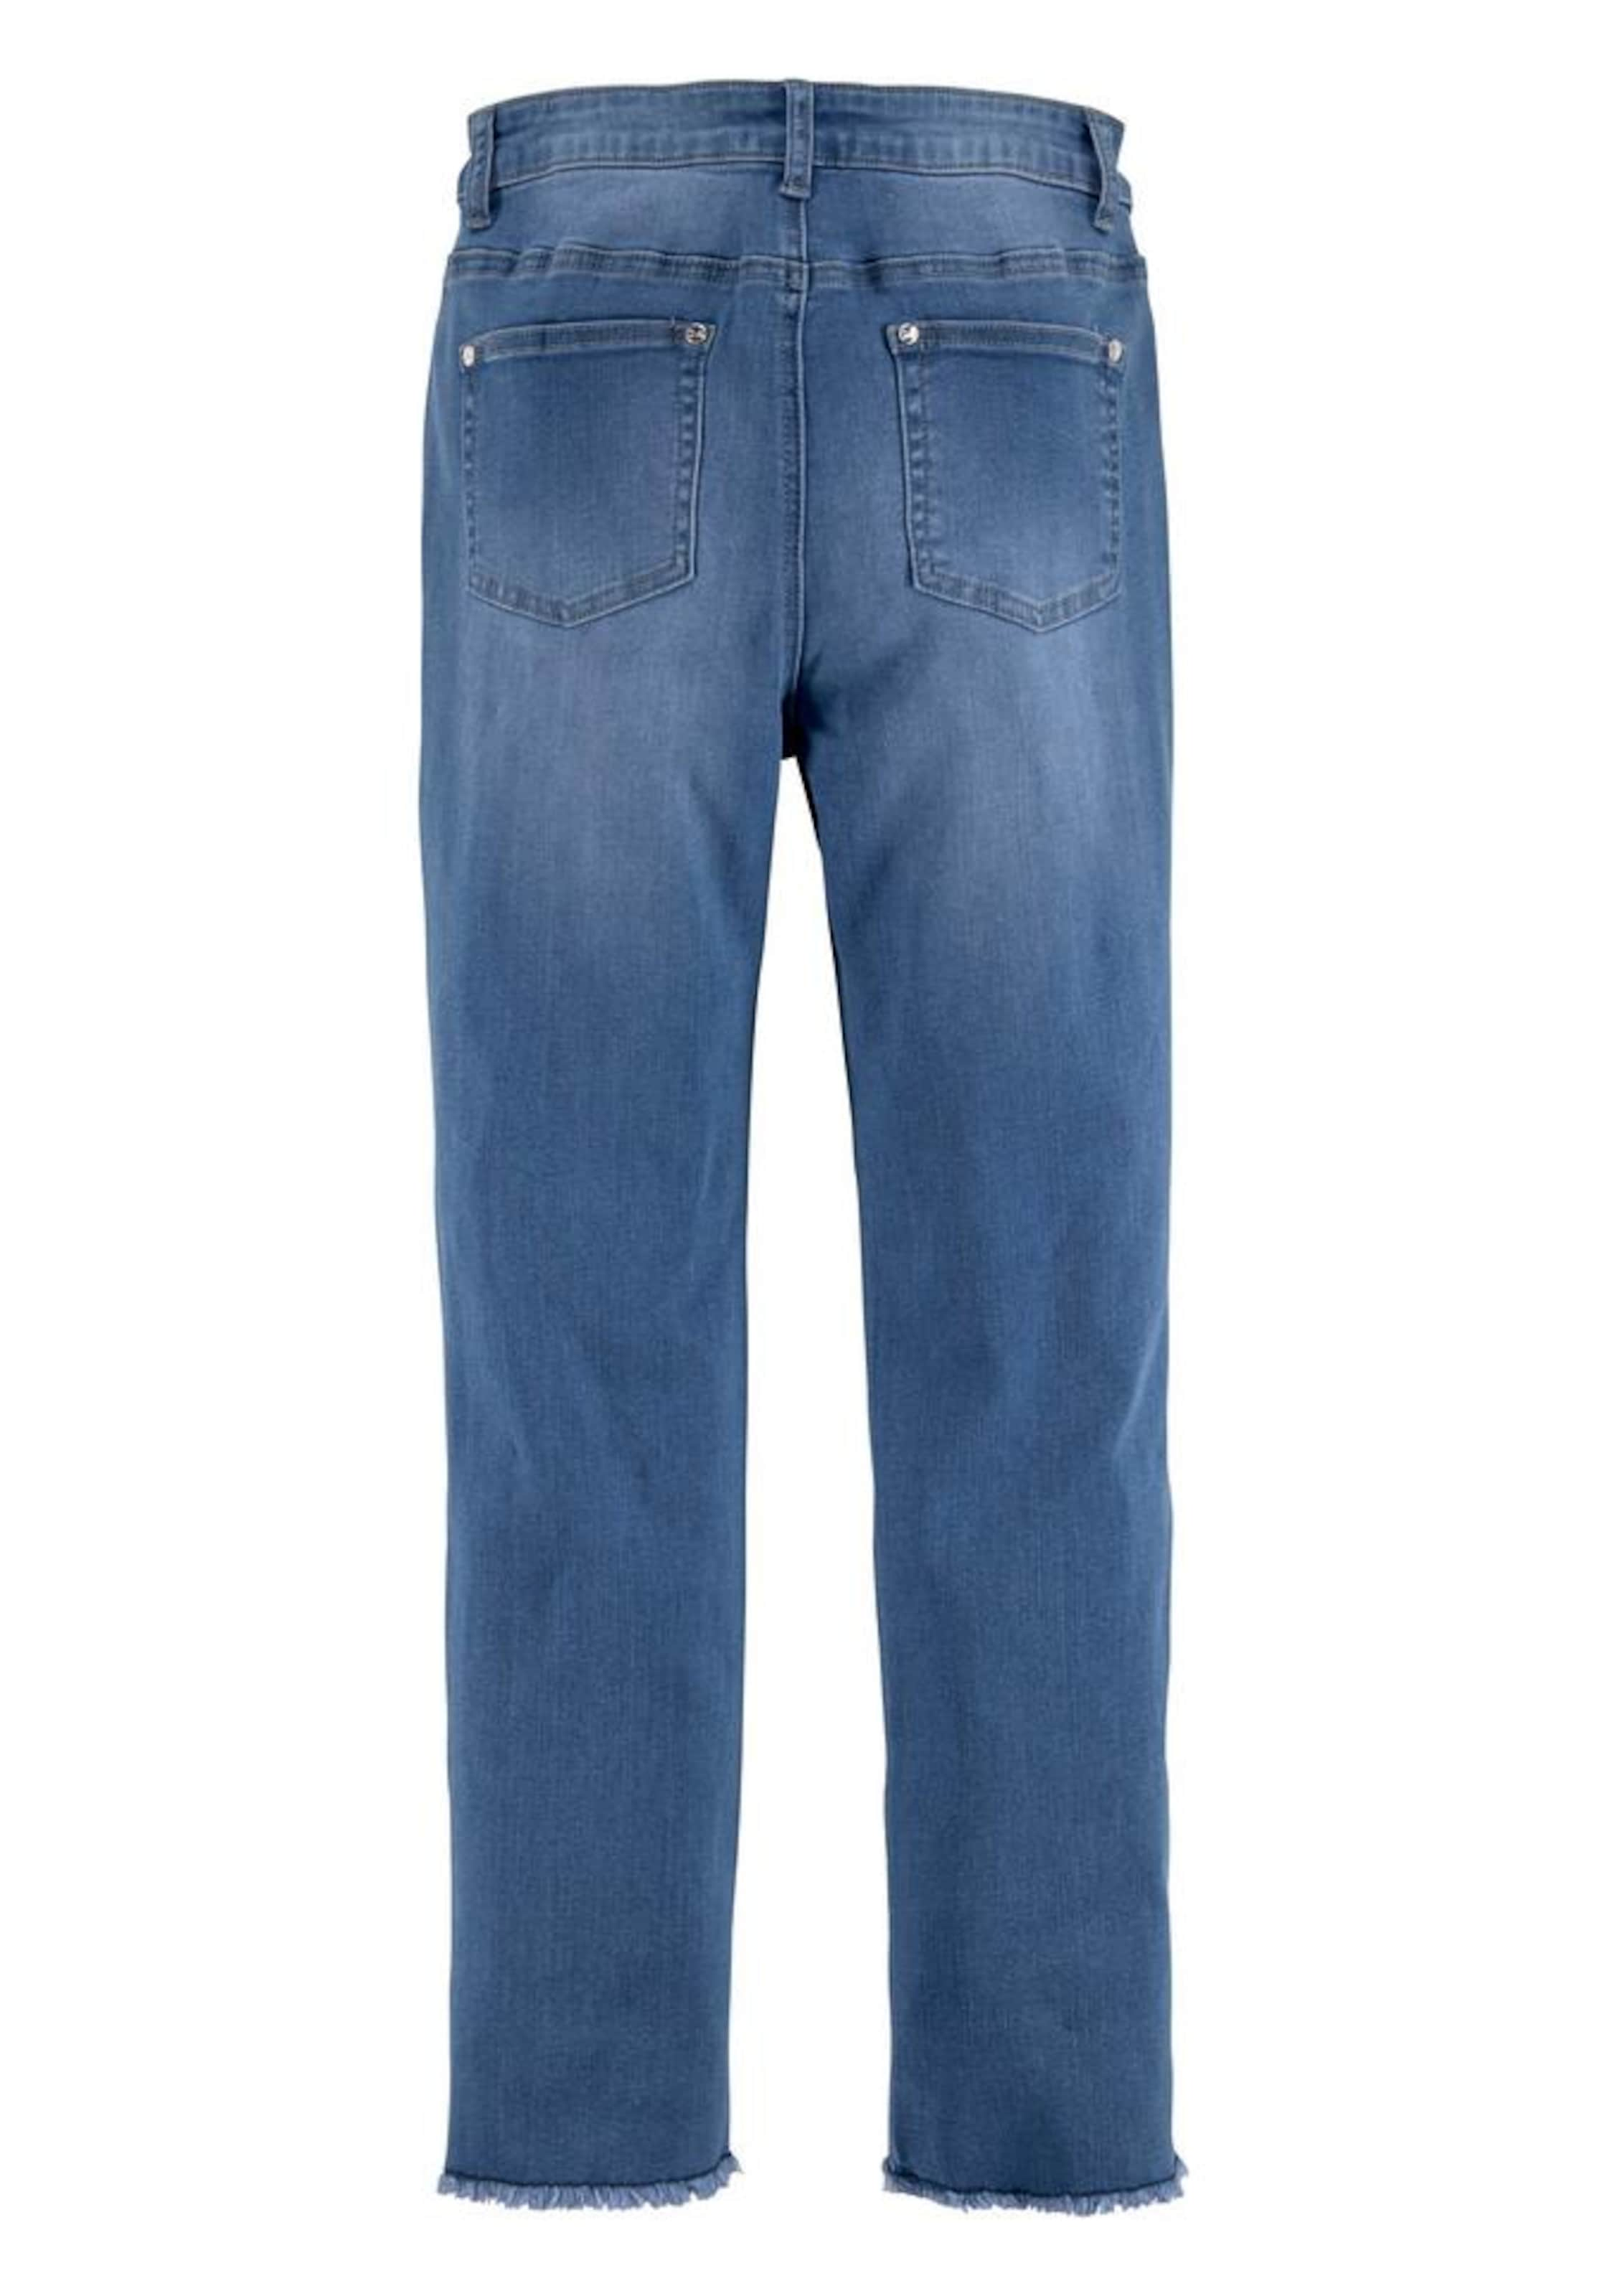 Jeans Weiß Maria Blue Kretschmer DenimHellpink In Guido OPiTkXZu